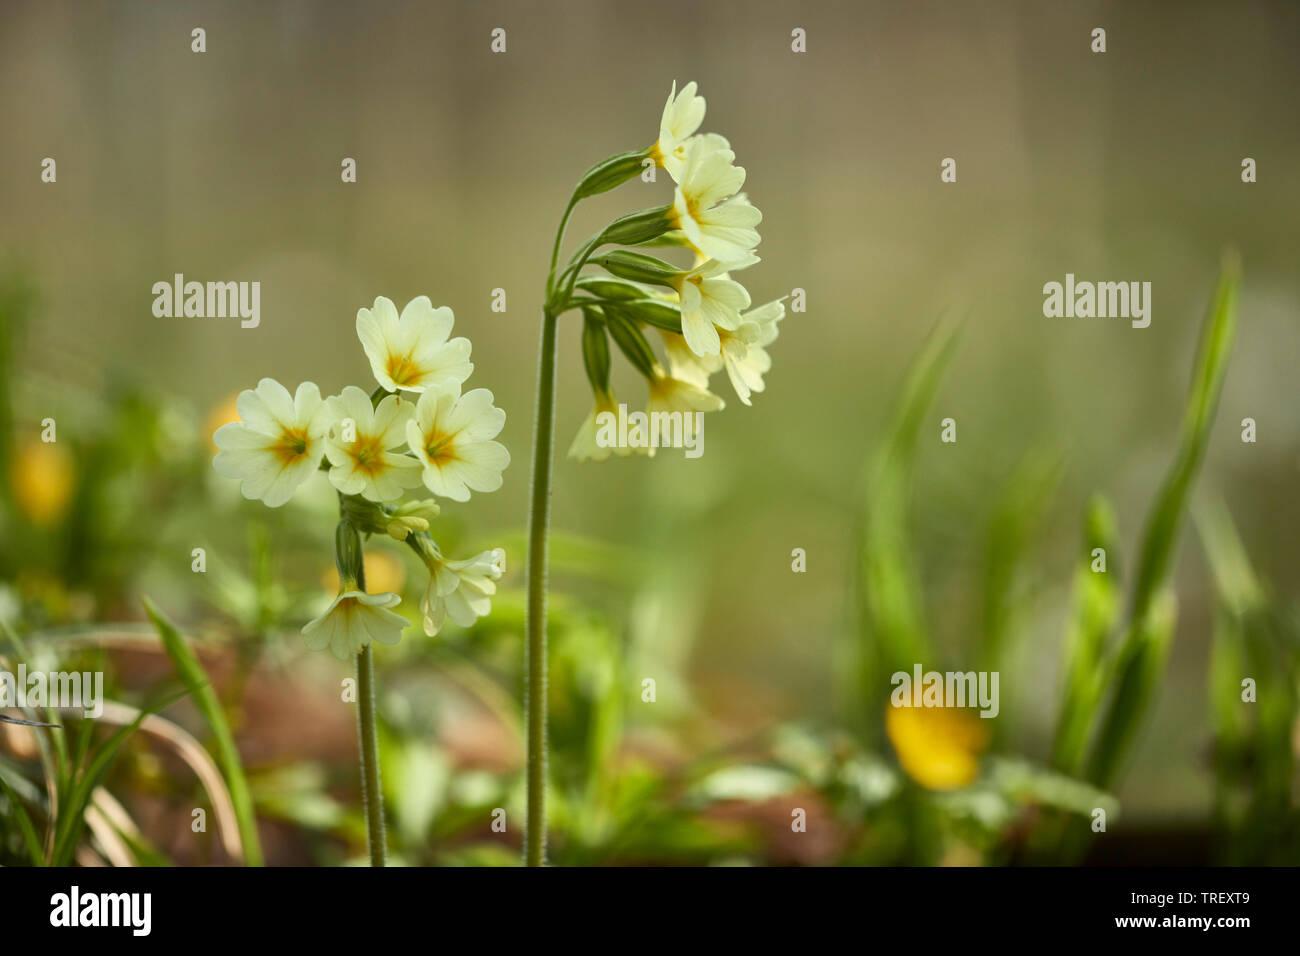 Common Cowslip (Primula veris), flowering plants. Germany Stock Photo